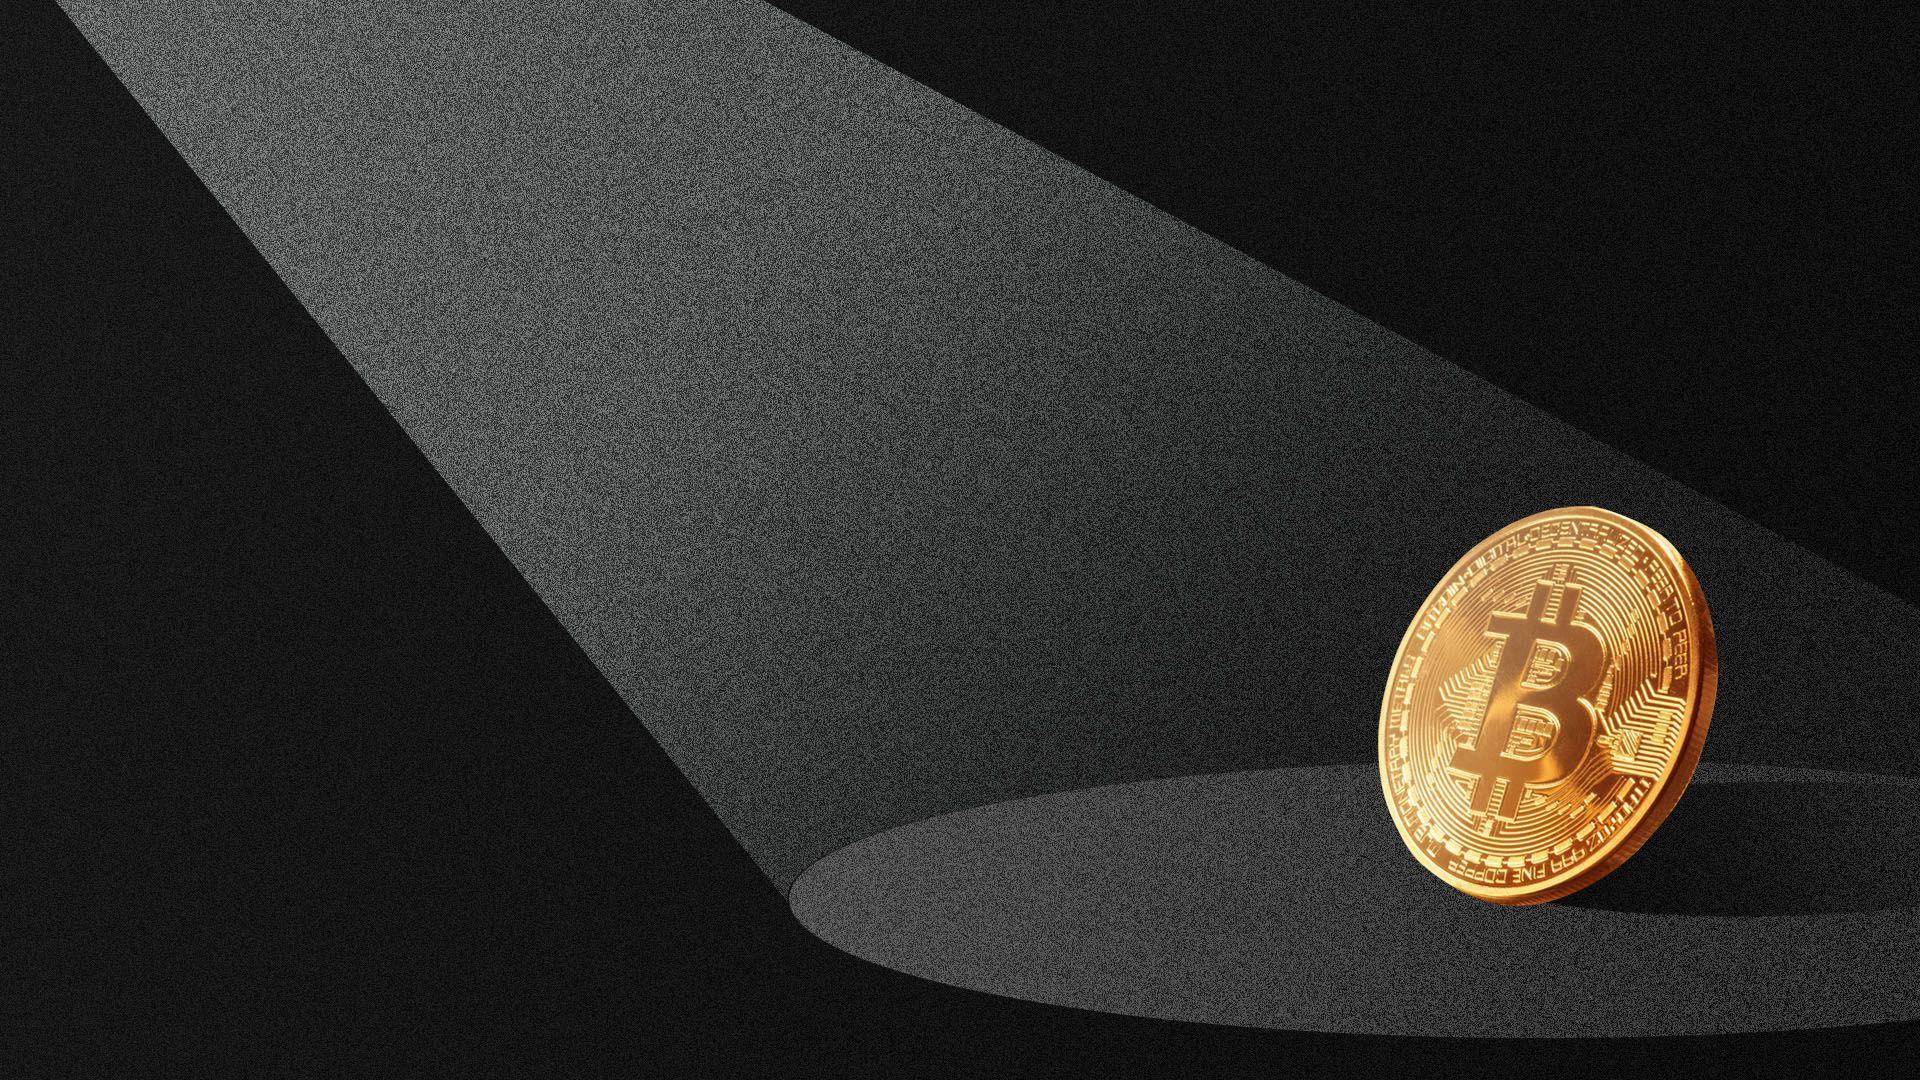 bitcoin thin client tradingview btc xrp